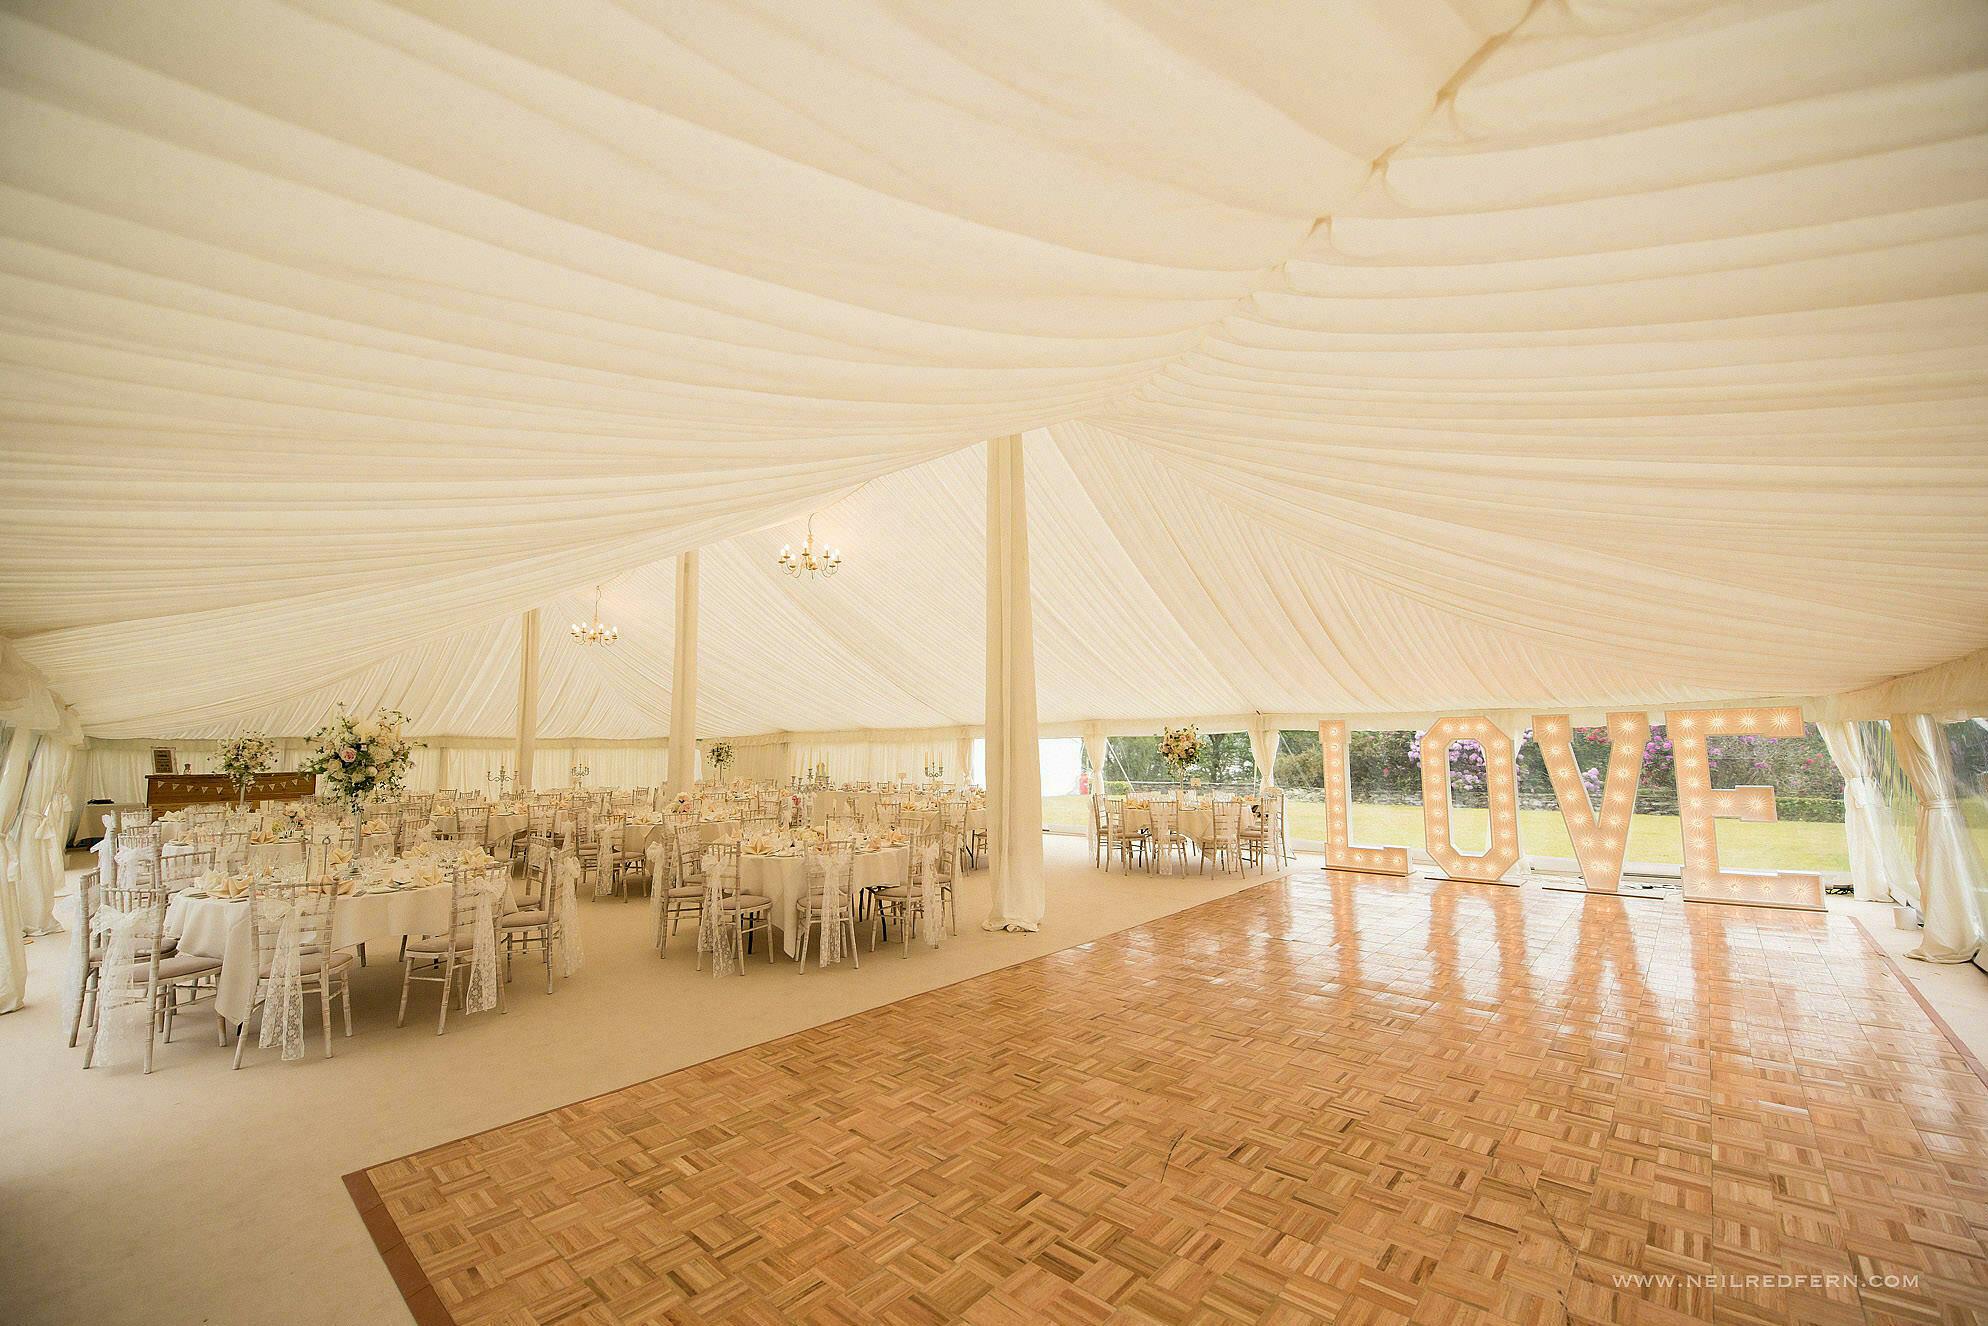 Cragwood Hotel wedding photographs 02